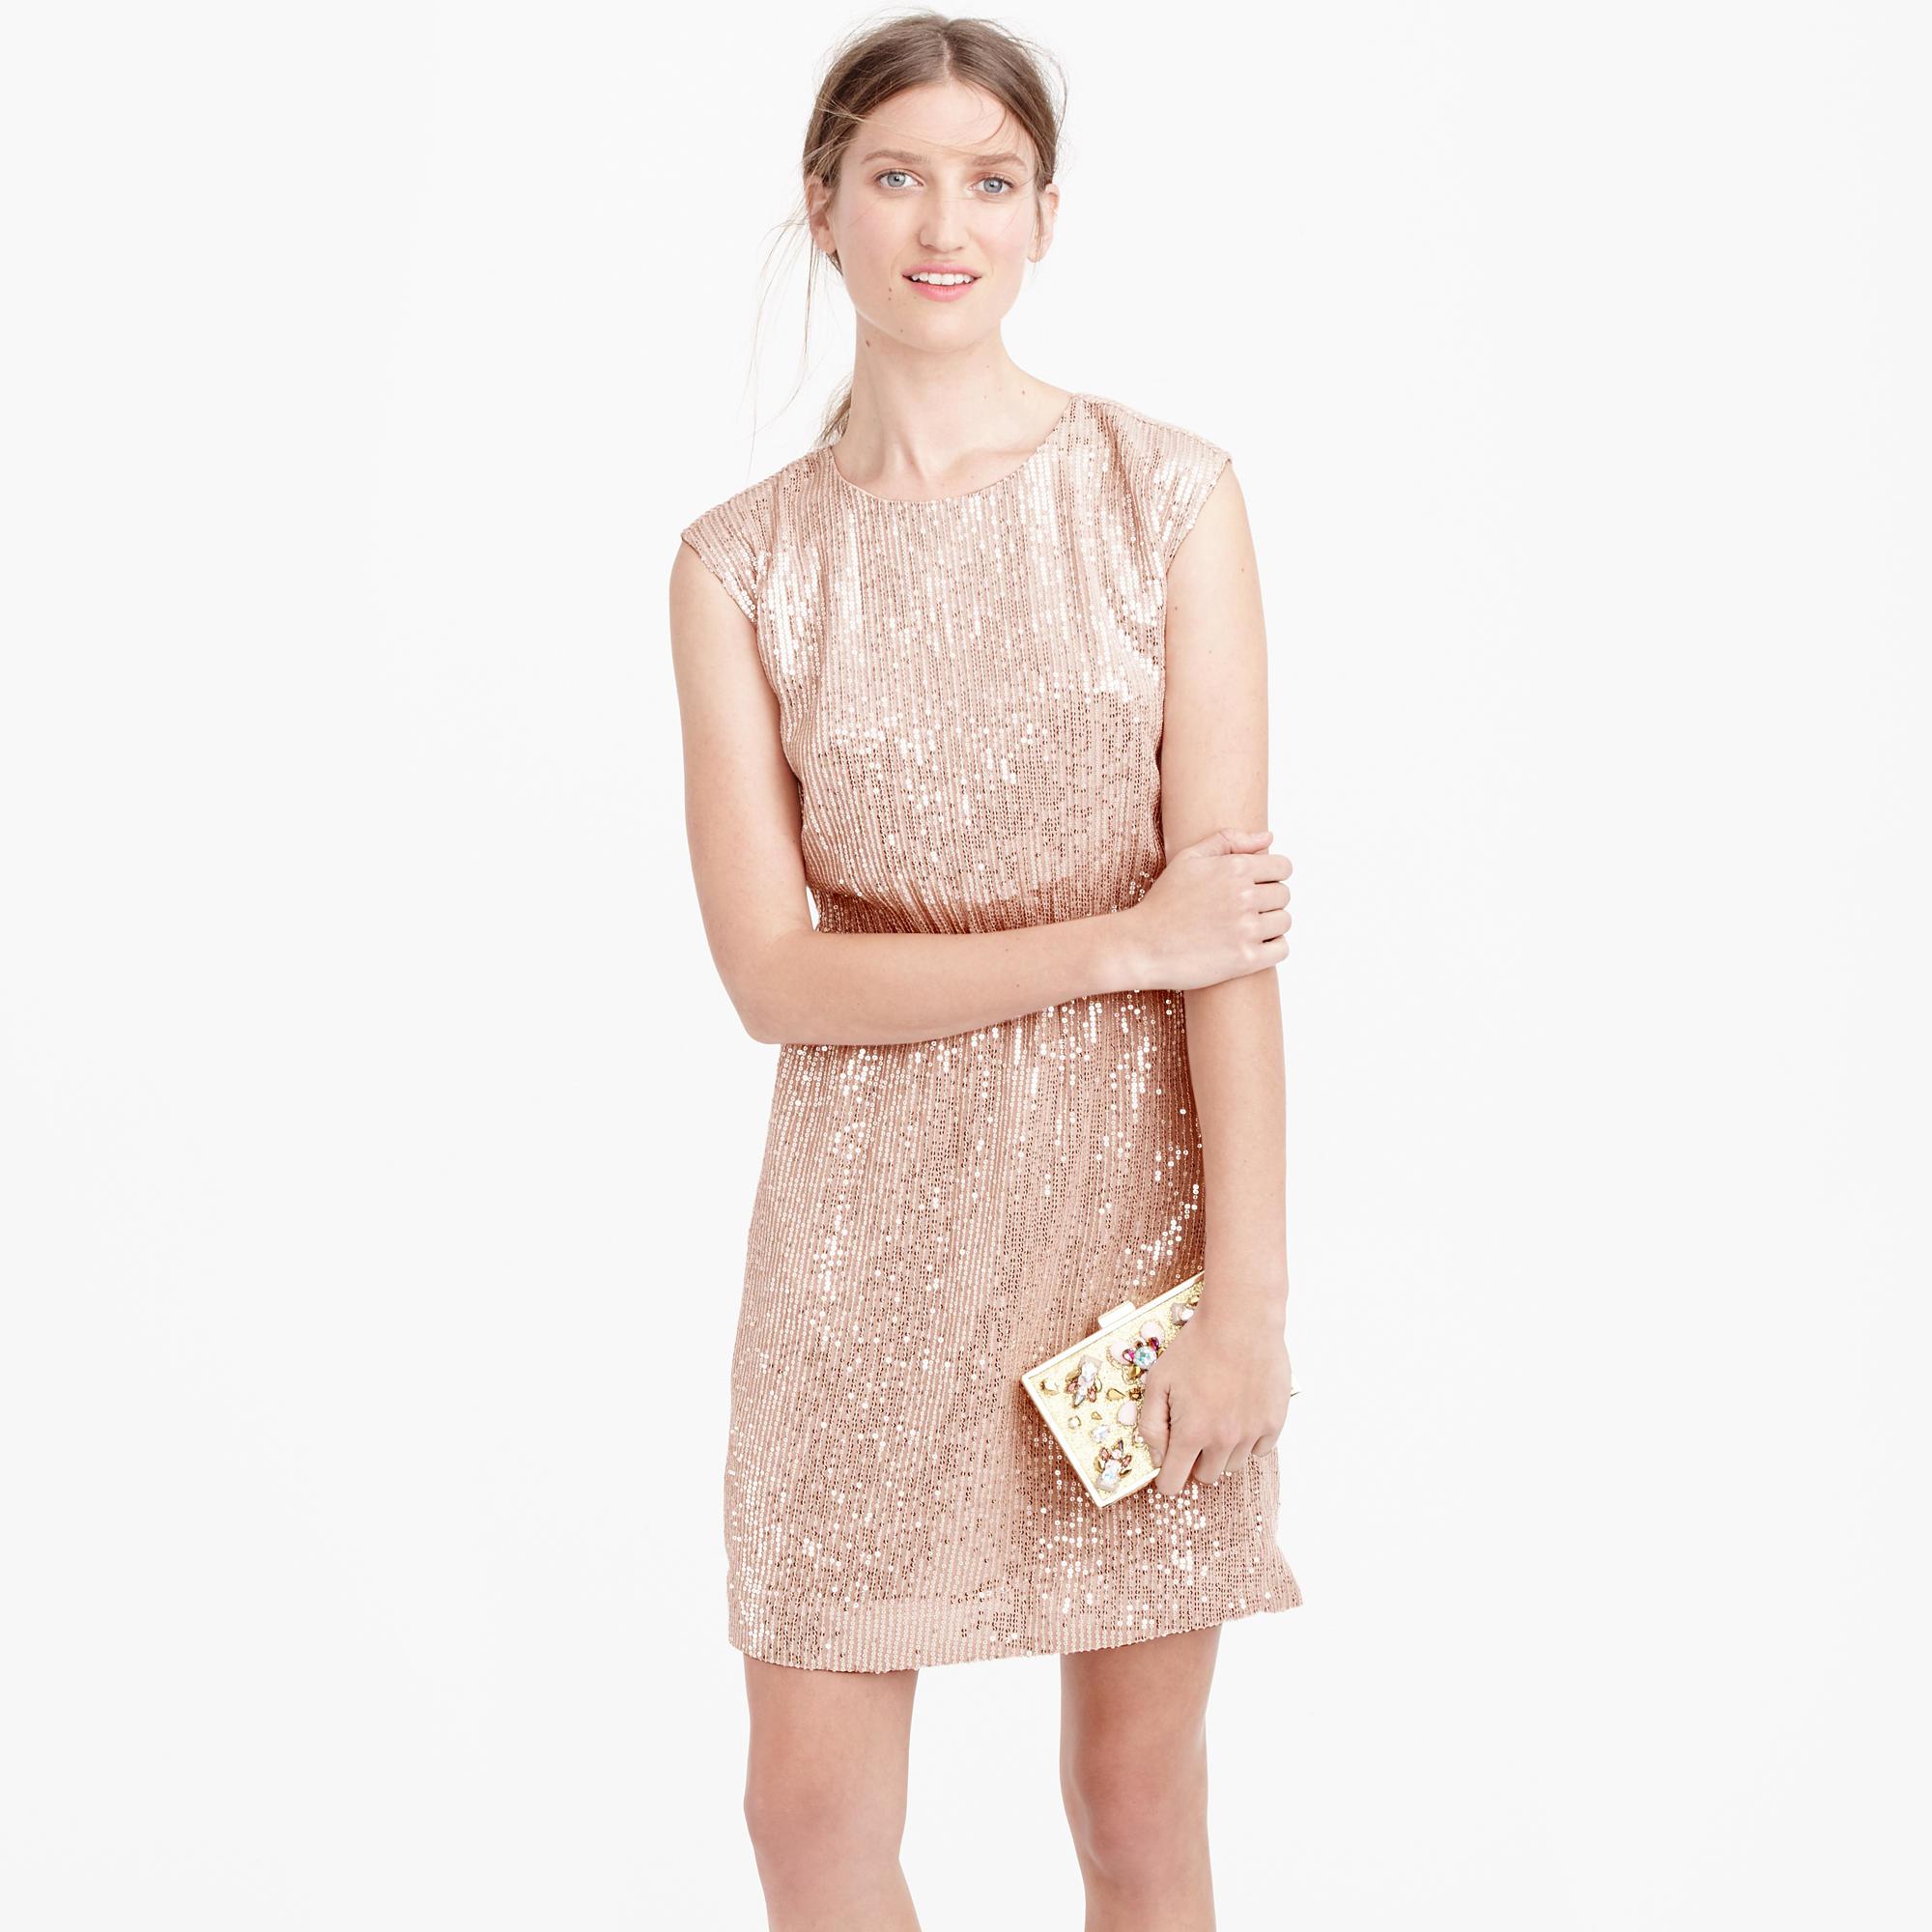 61e7c8a2 Long Gold Sequin Dress Canada Photo Wallpaper Hd A